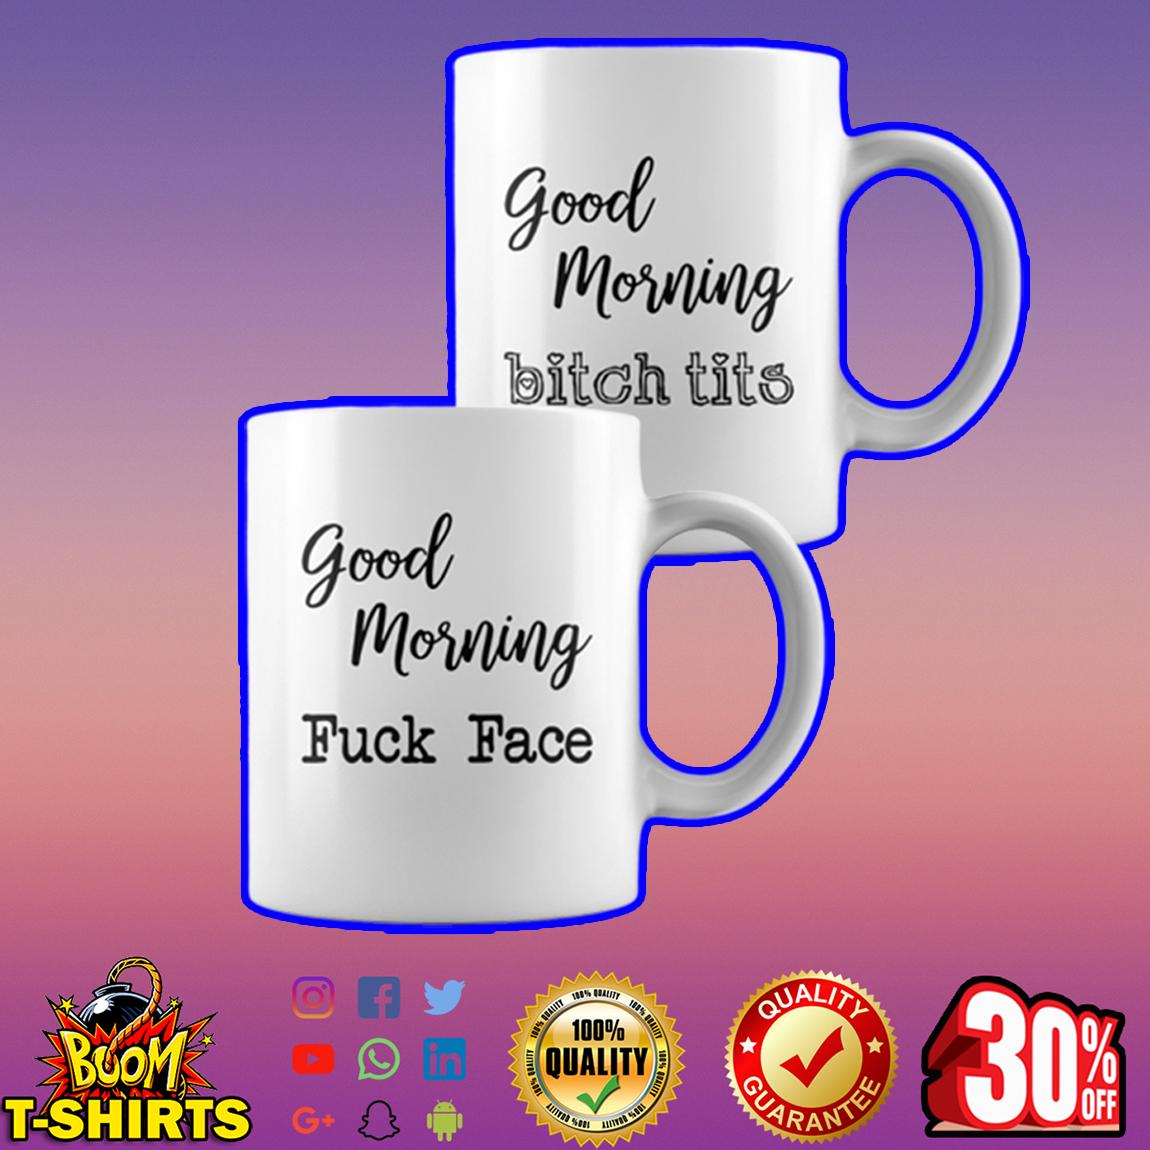 Good morning fuck face - Good morning bitch tits mug